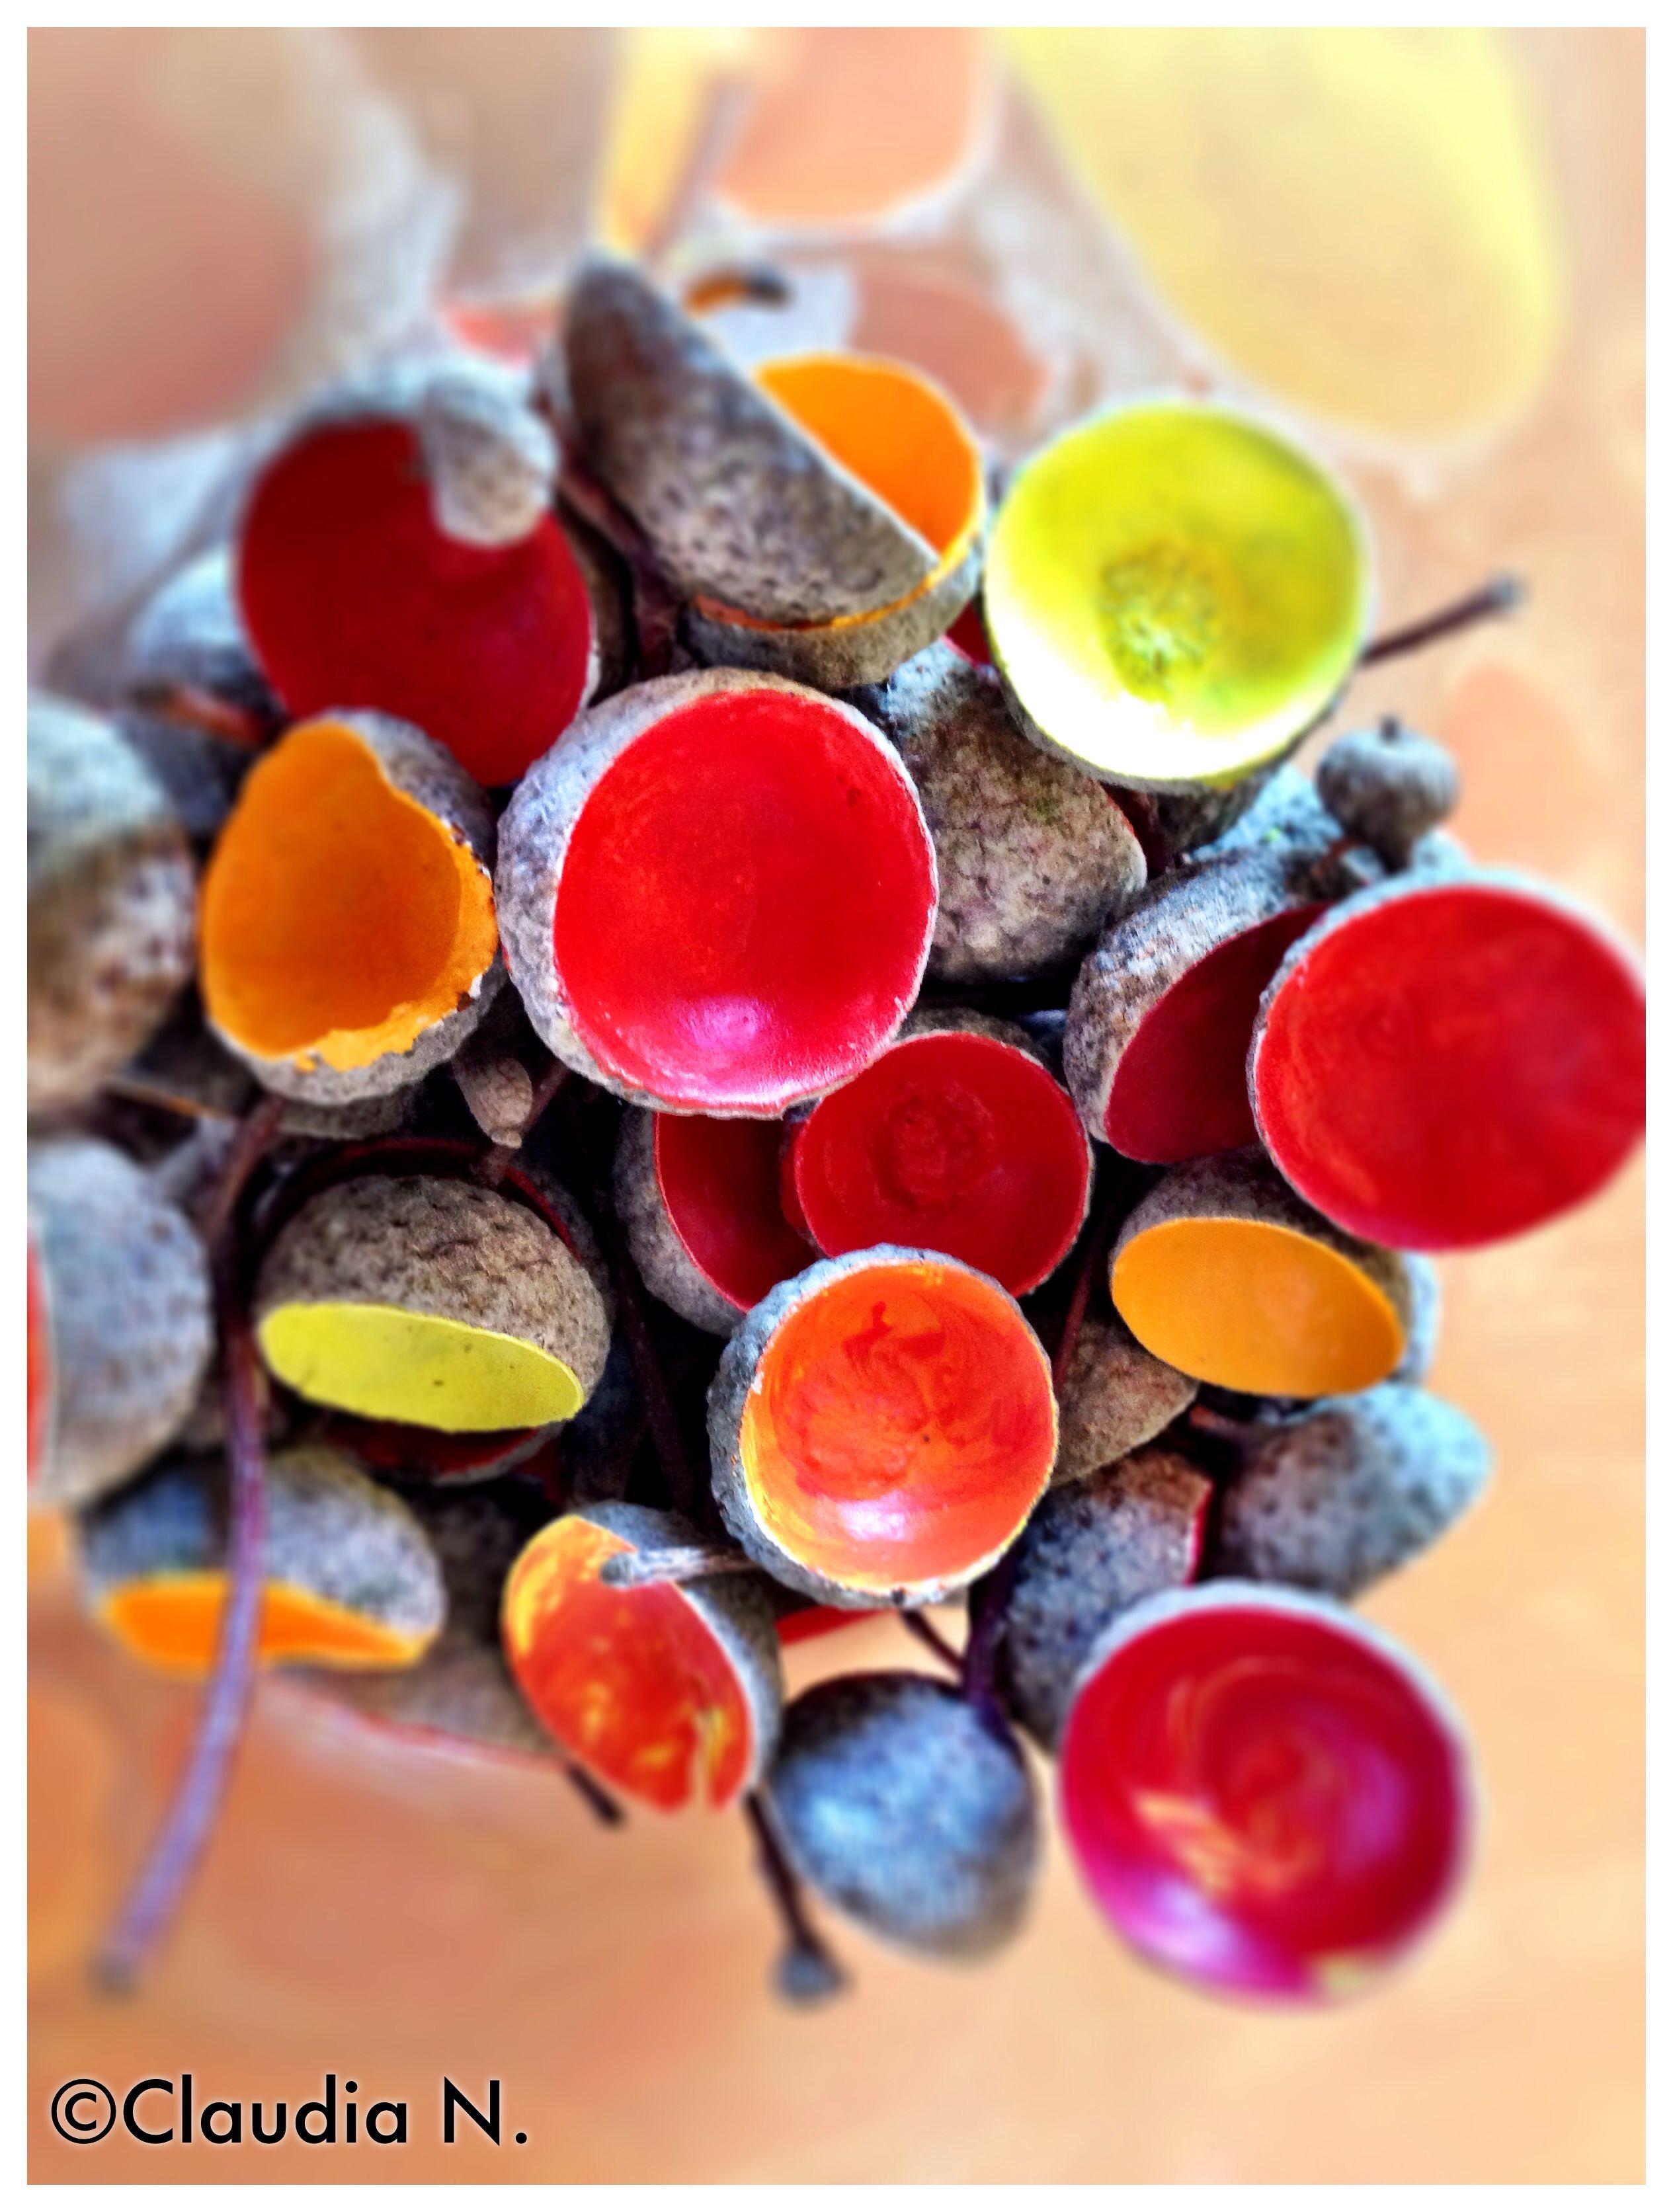 bemalte eicheln mit acrylfarbe herbst pinterest herbst. Black Bedroom Furniture Sets. Home Design Ideas